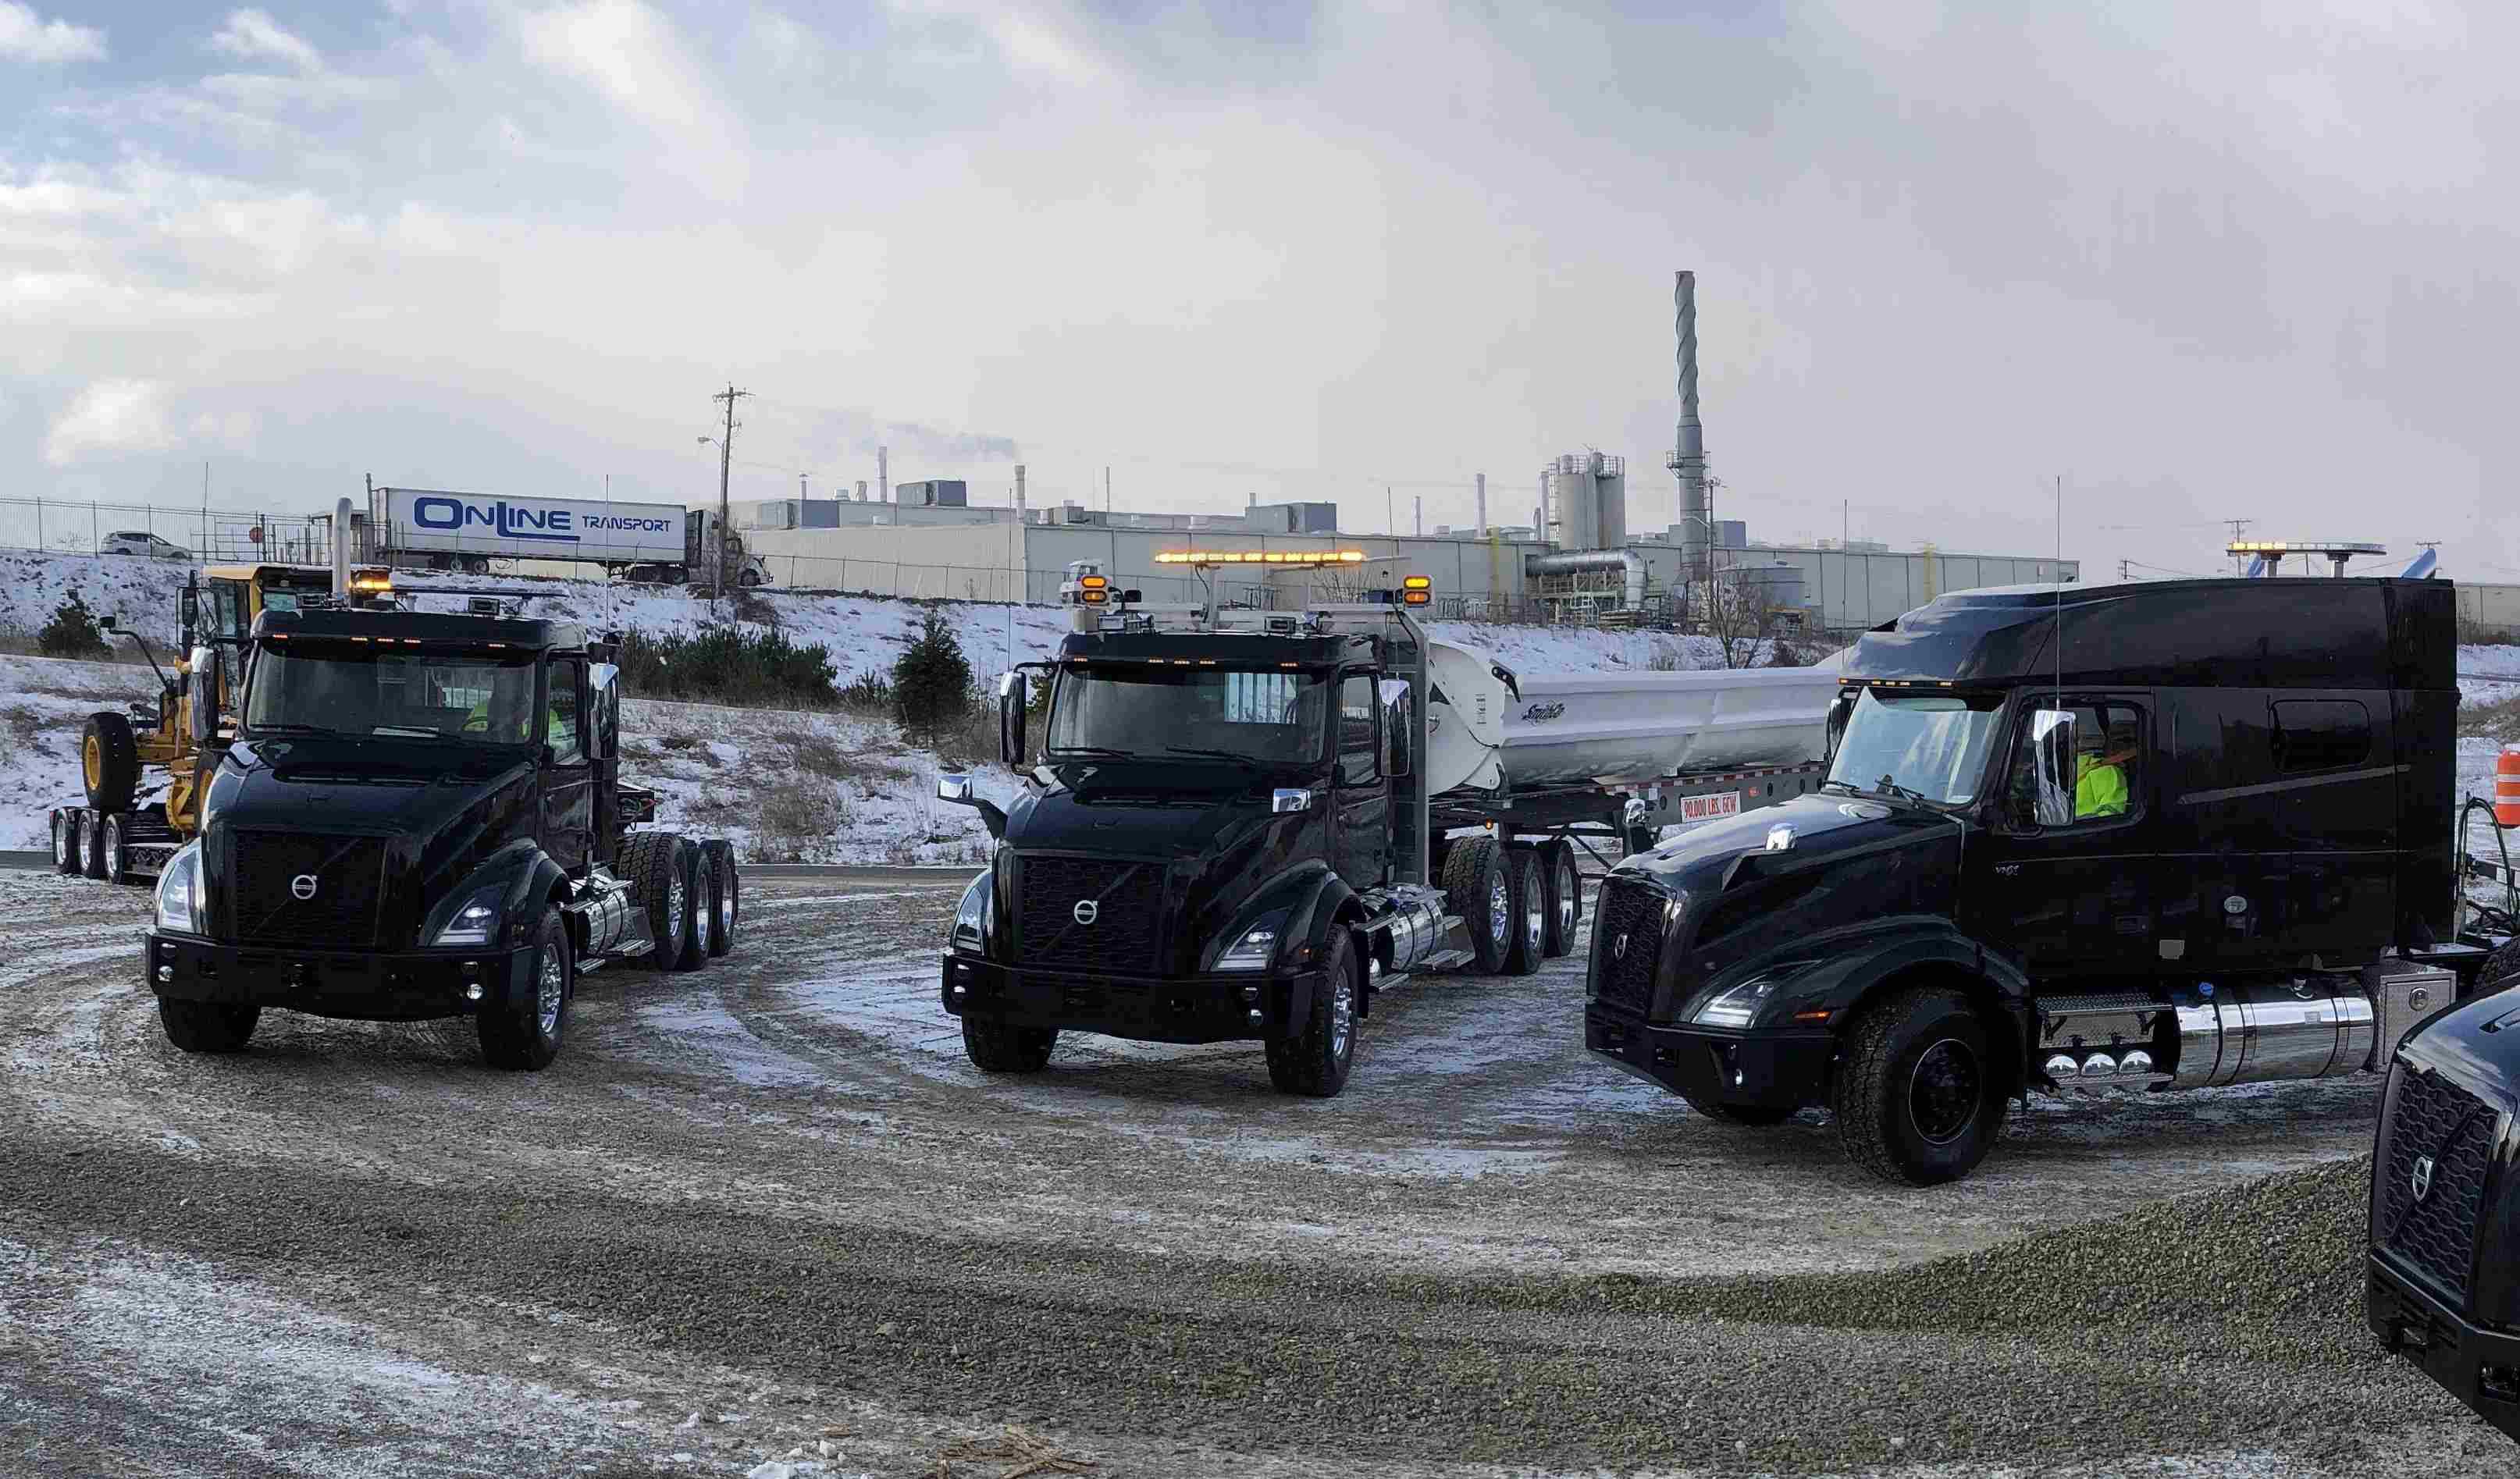 Three Volvo VNX series semi trucks parked